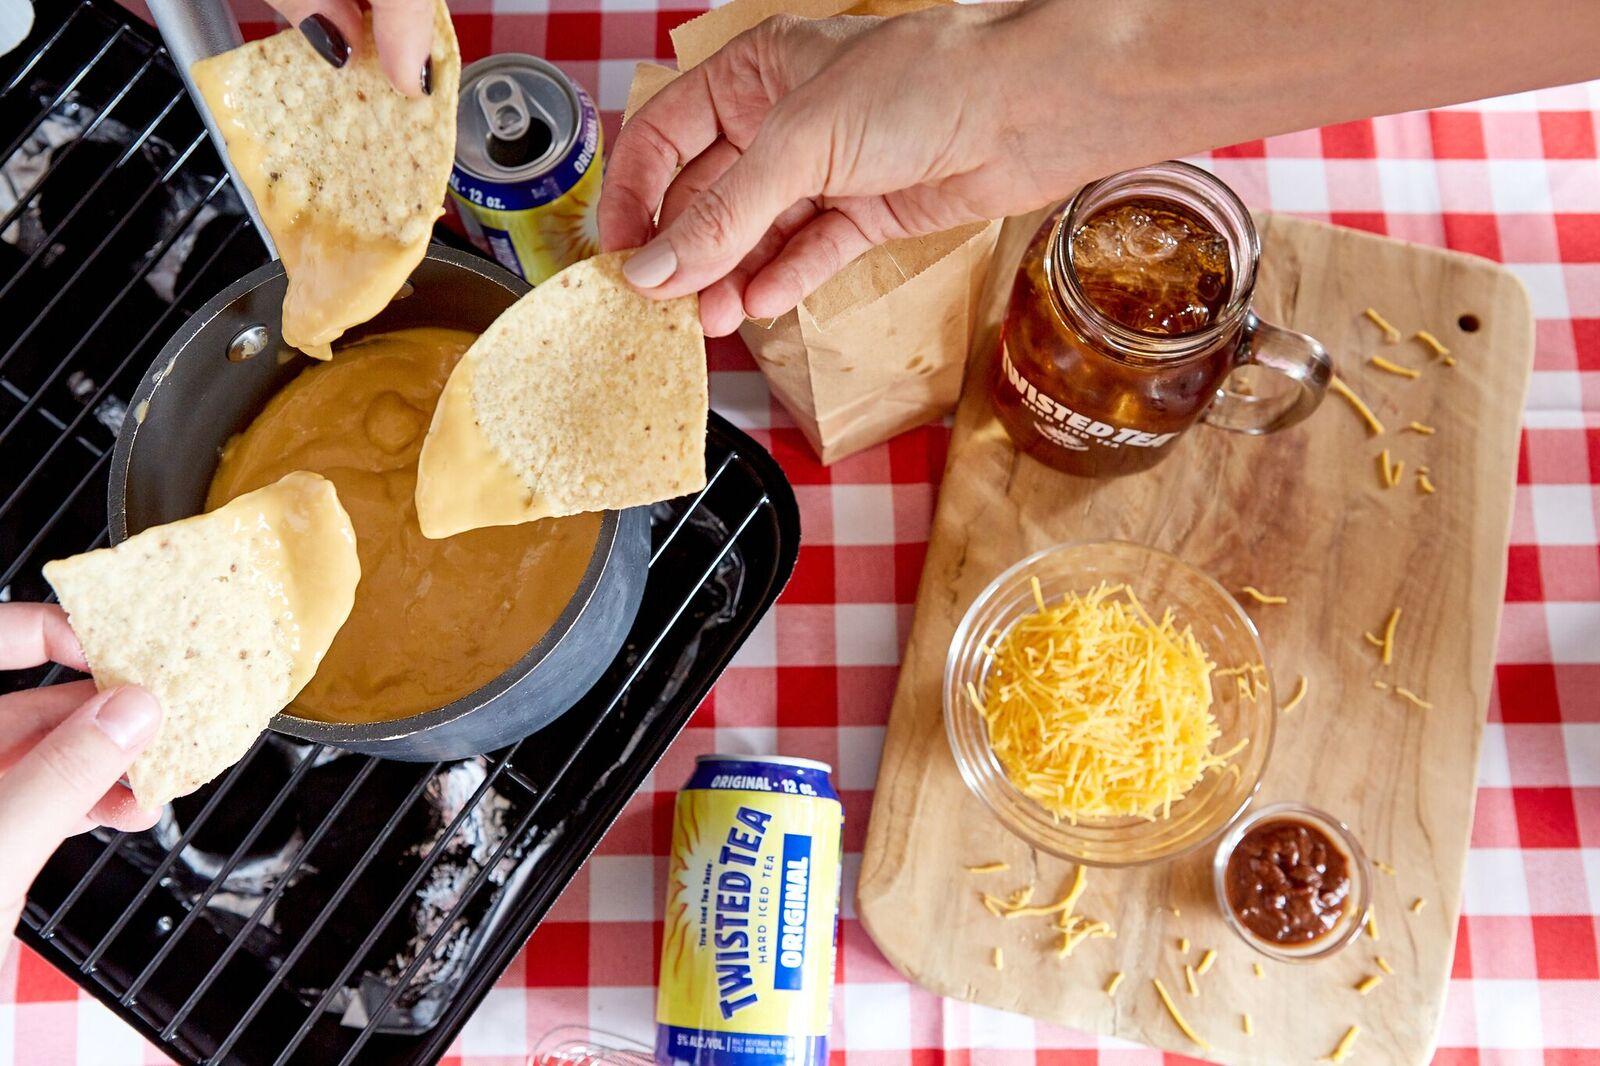 Superbowl Food, Super Bowl Food, Super Bowl Recipes, Super Bowl Food Recipes, Super Bowl Food Ideas, Best Super Bowl